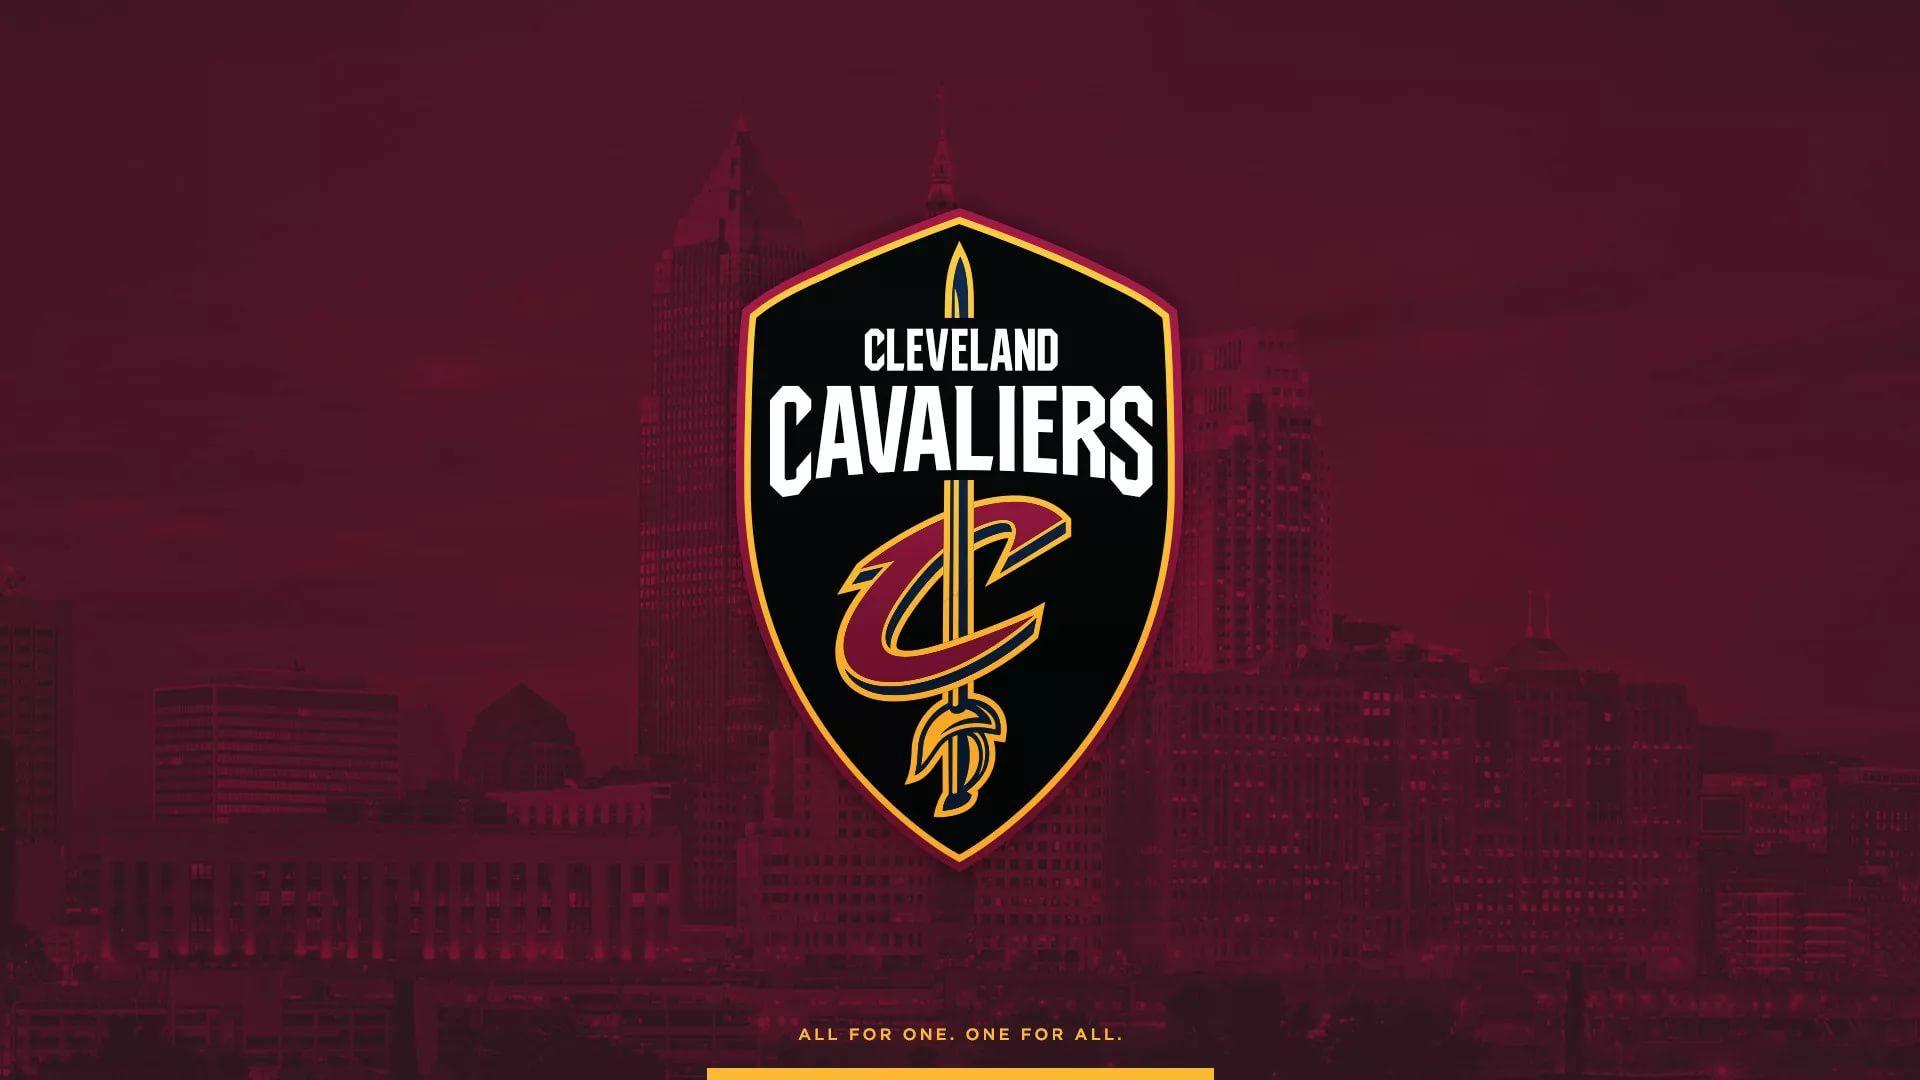 Cleveland hd wallpaper download